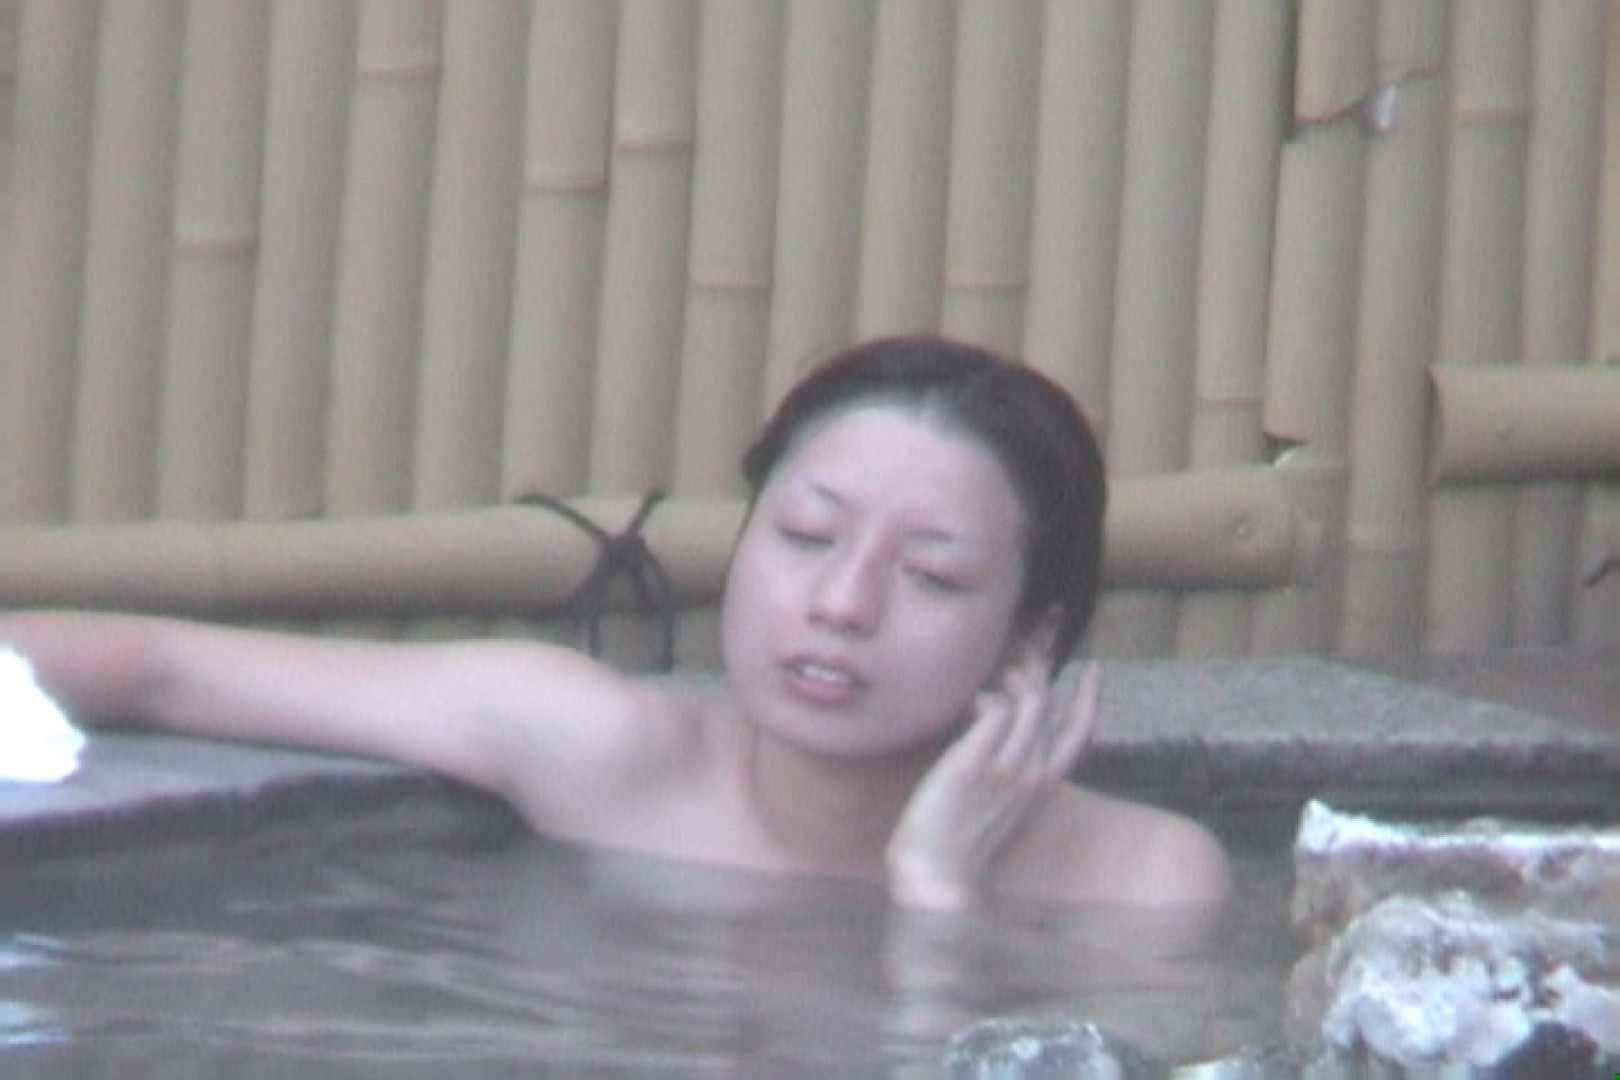 Aquaな露天風呂Vol.608 美しいOLの裸体 AV動画キャプチャ 95pic 71